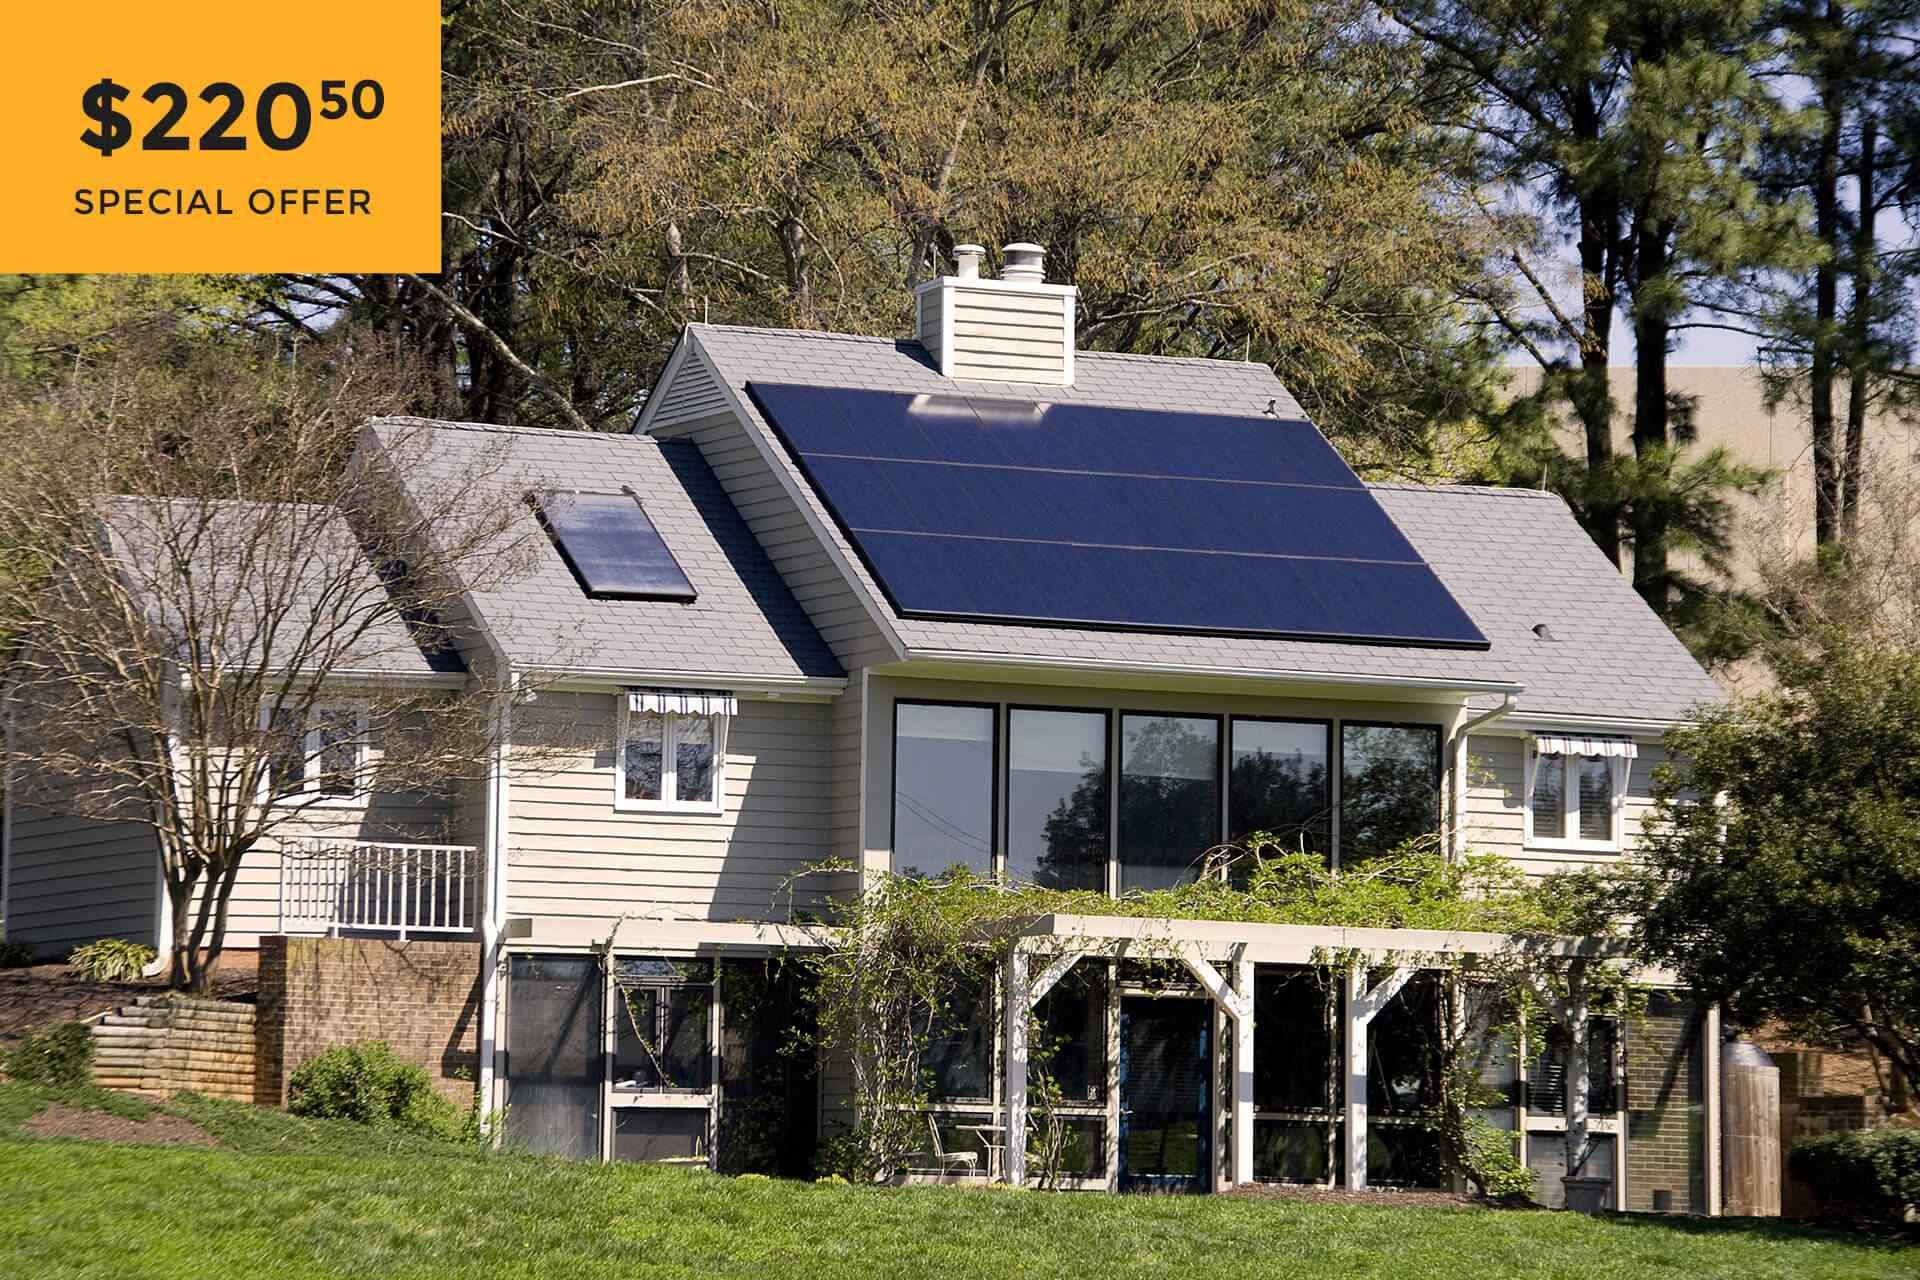 Get a Mission Solar Panel Built in San Antonio, Texas